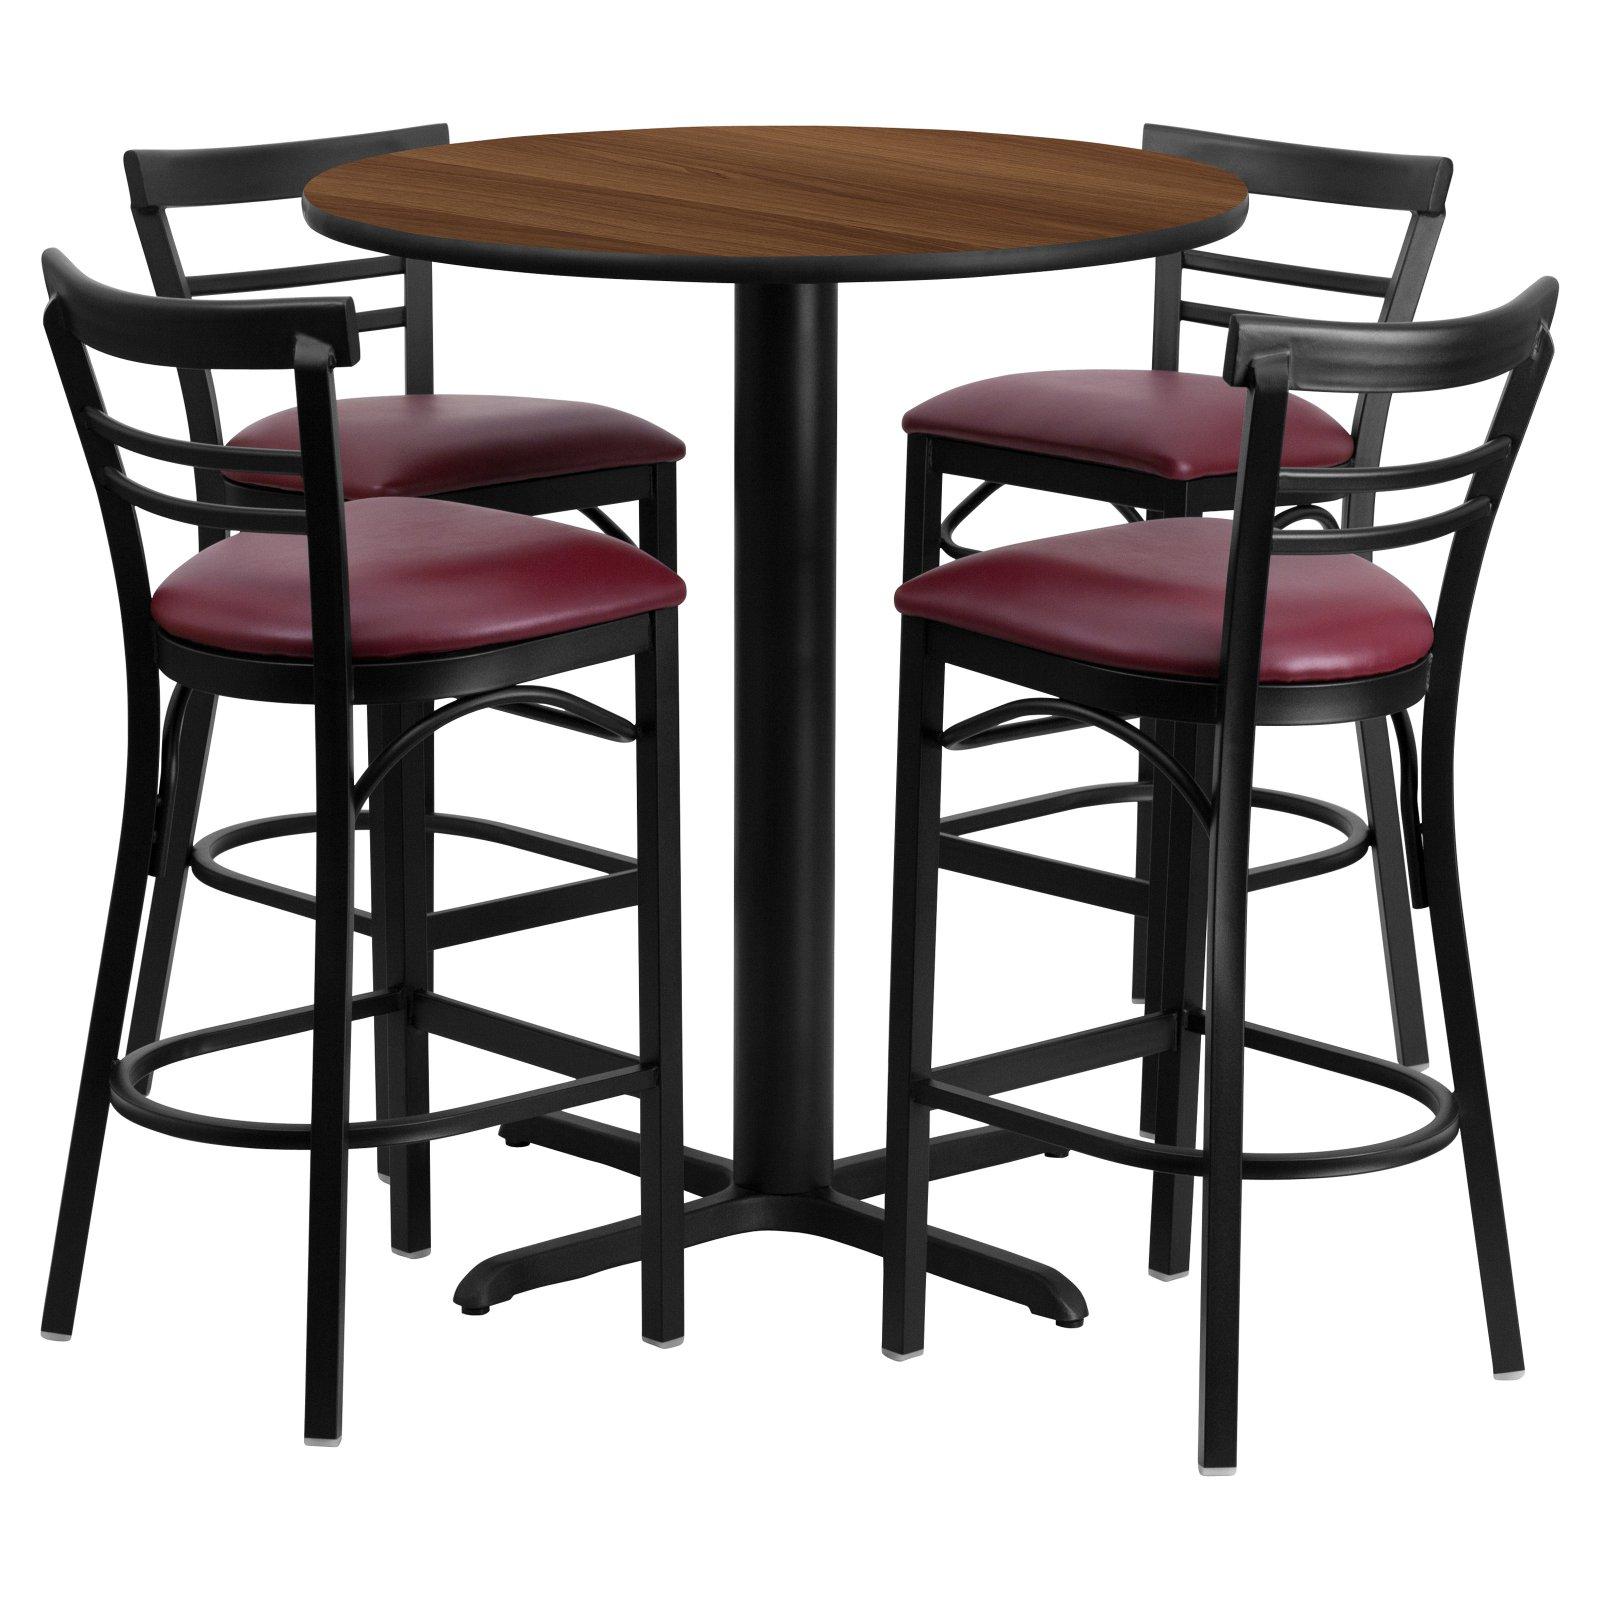 Flash Furniture 24'' Round Walnut Laminate Table Set with 4 Ladder Back Metal Barstools, Burgundy Vinyl Seat Black, Burgundy, Walnut